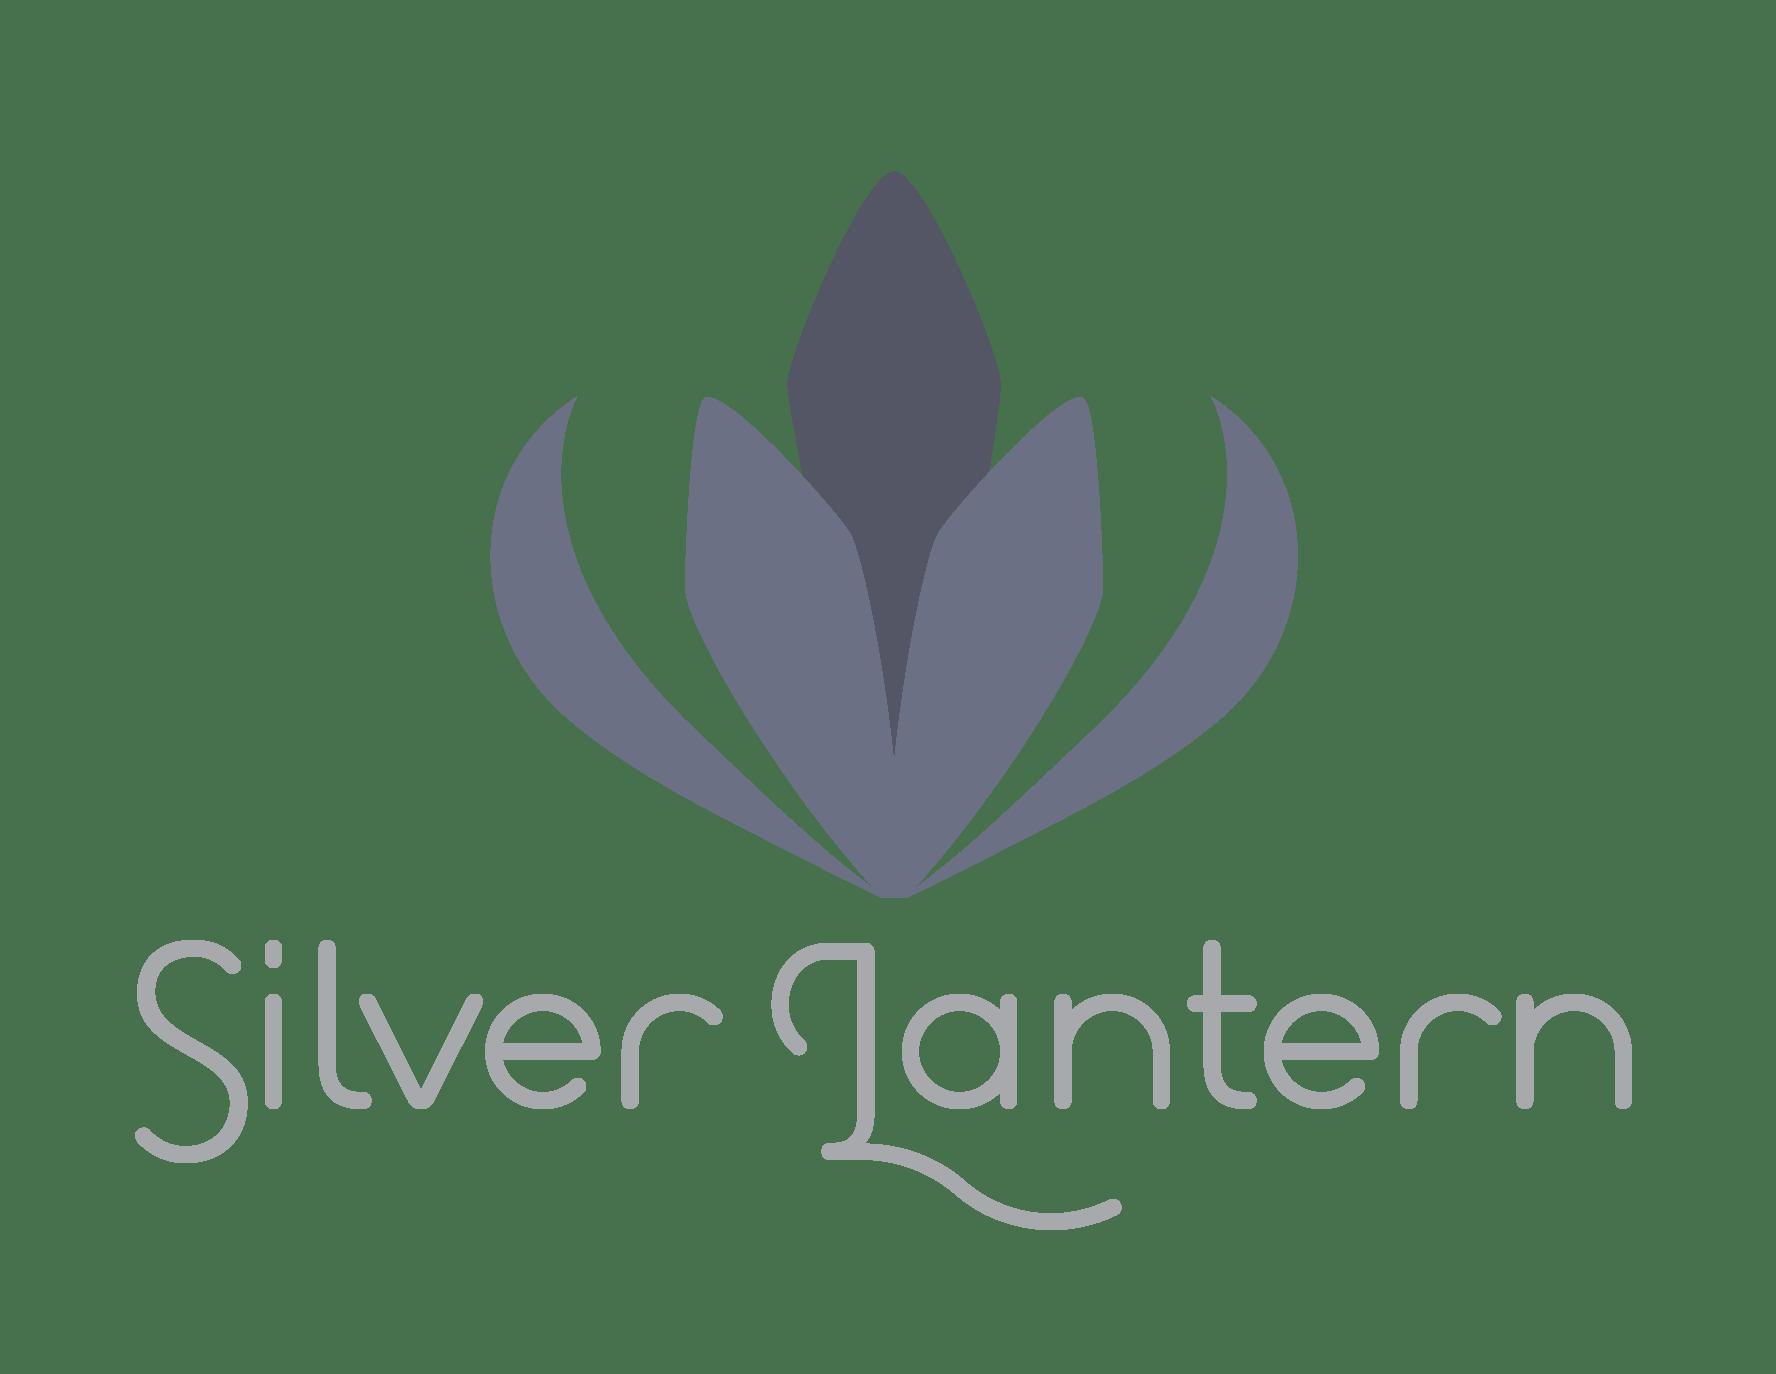 Silver Lantern Tea